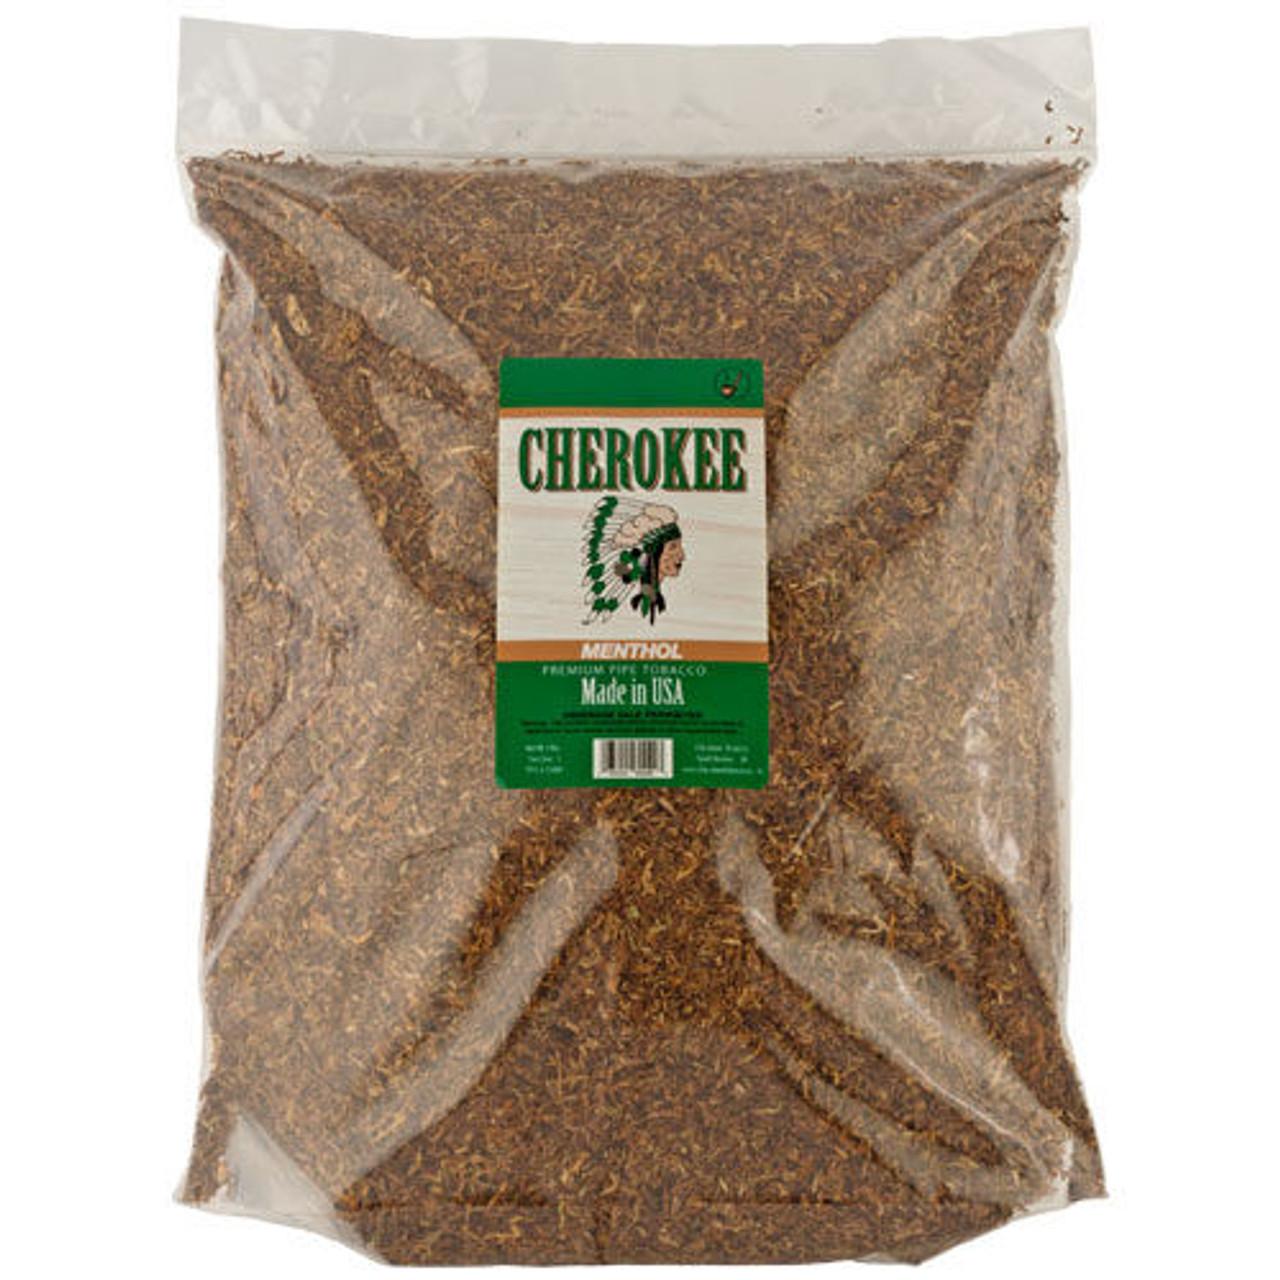 Cherokee Fine-Cut Tobacco Menthol   5 Lb. Bag